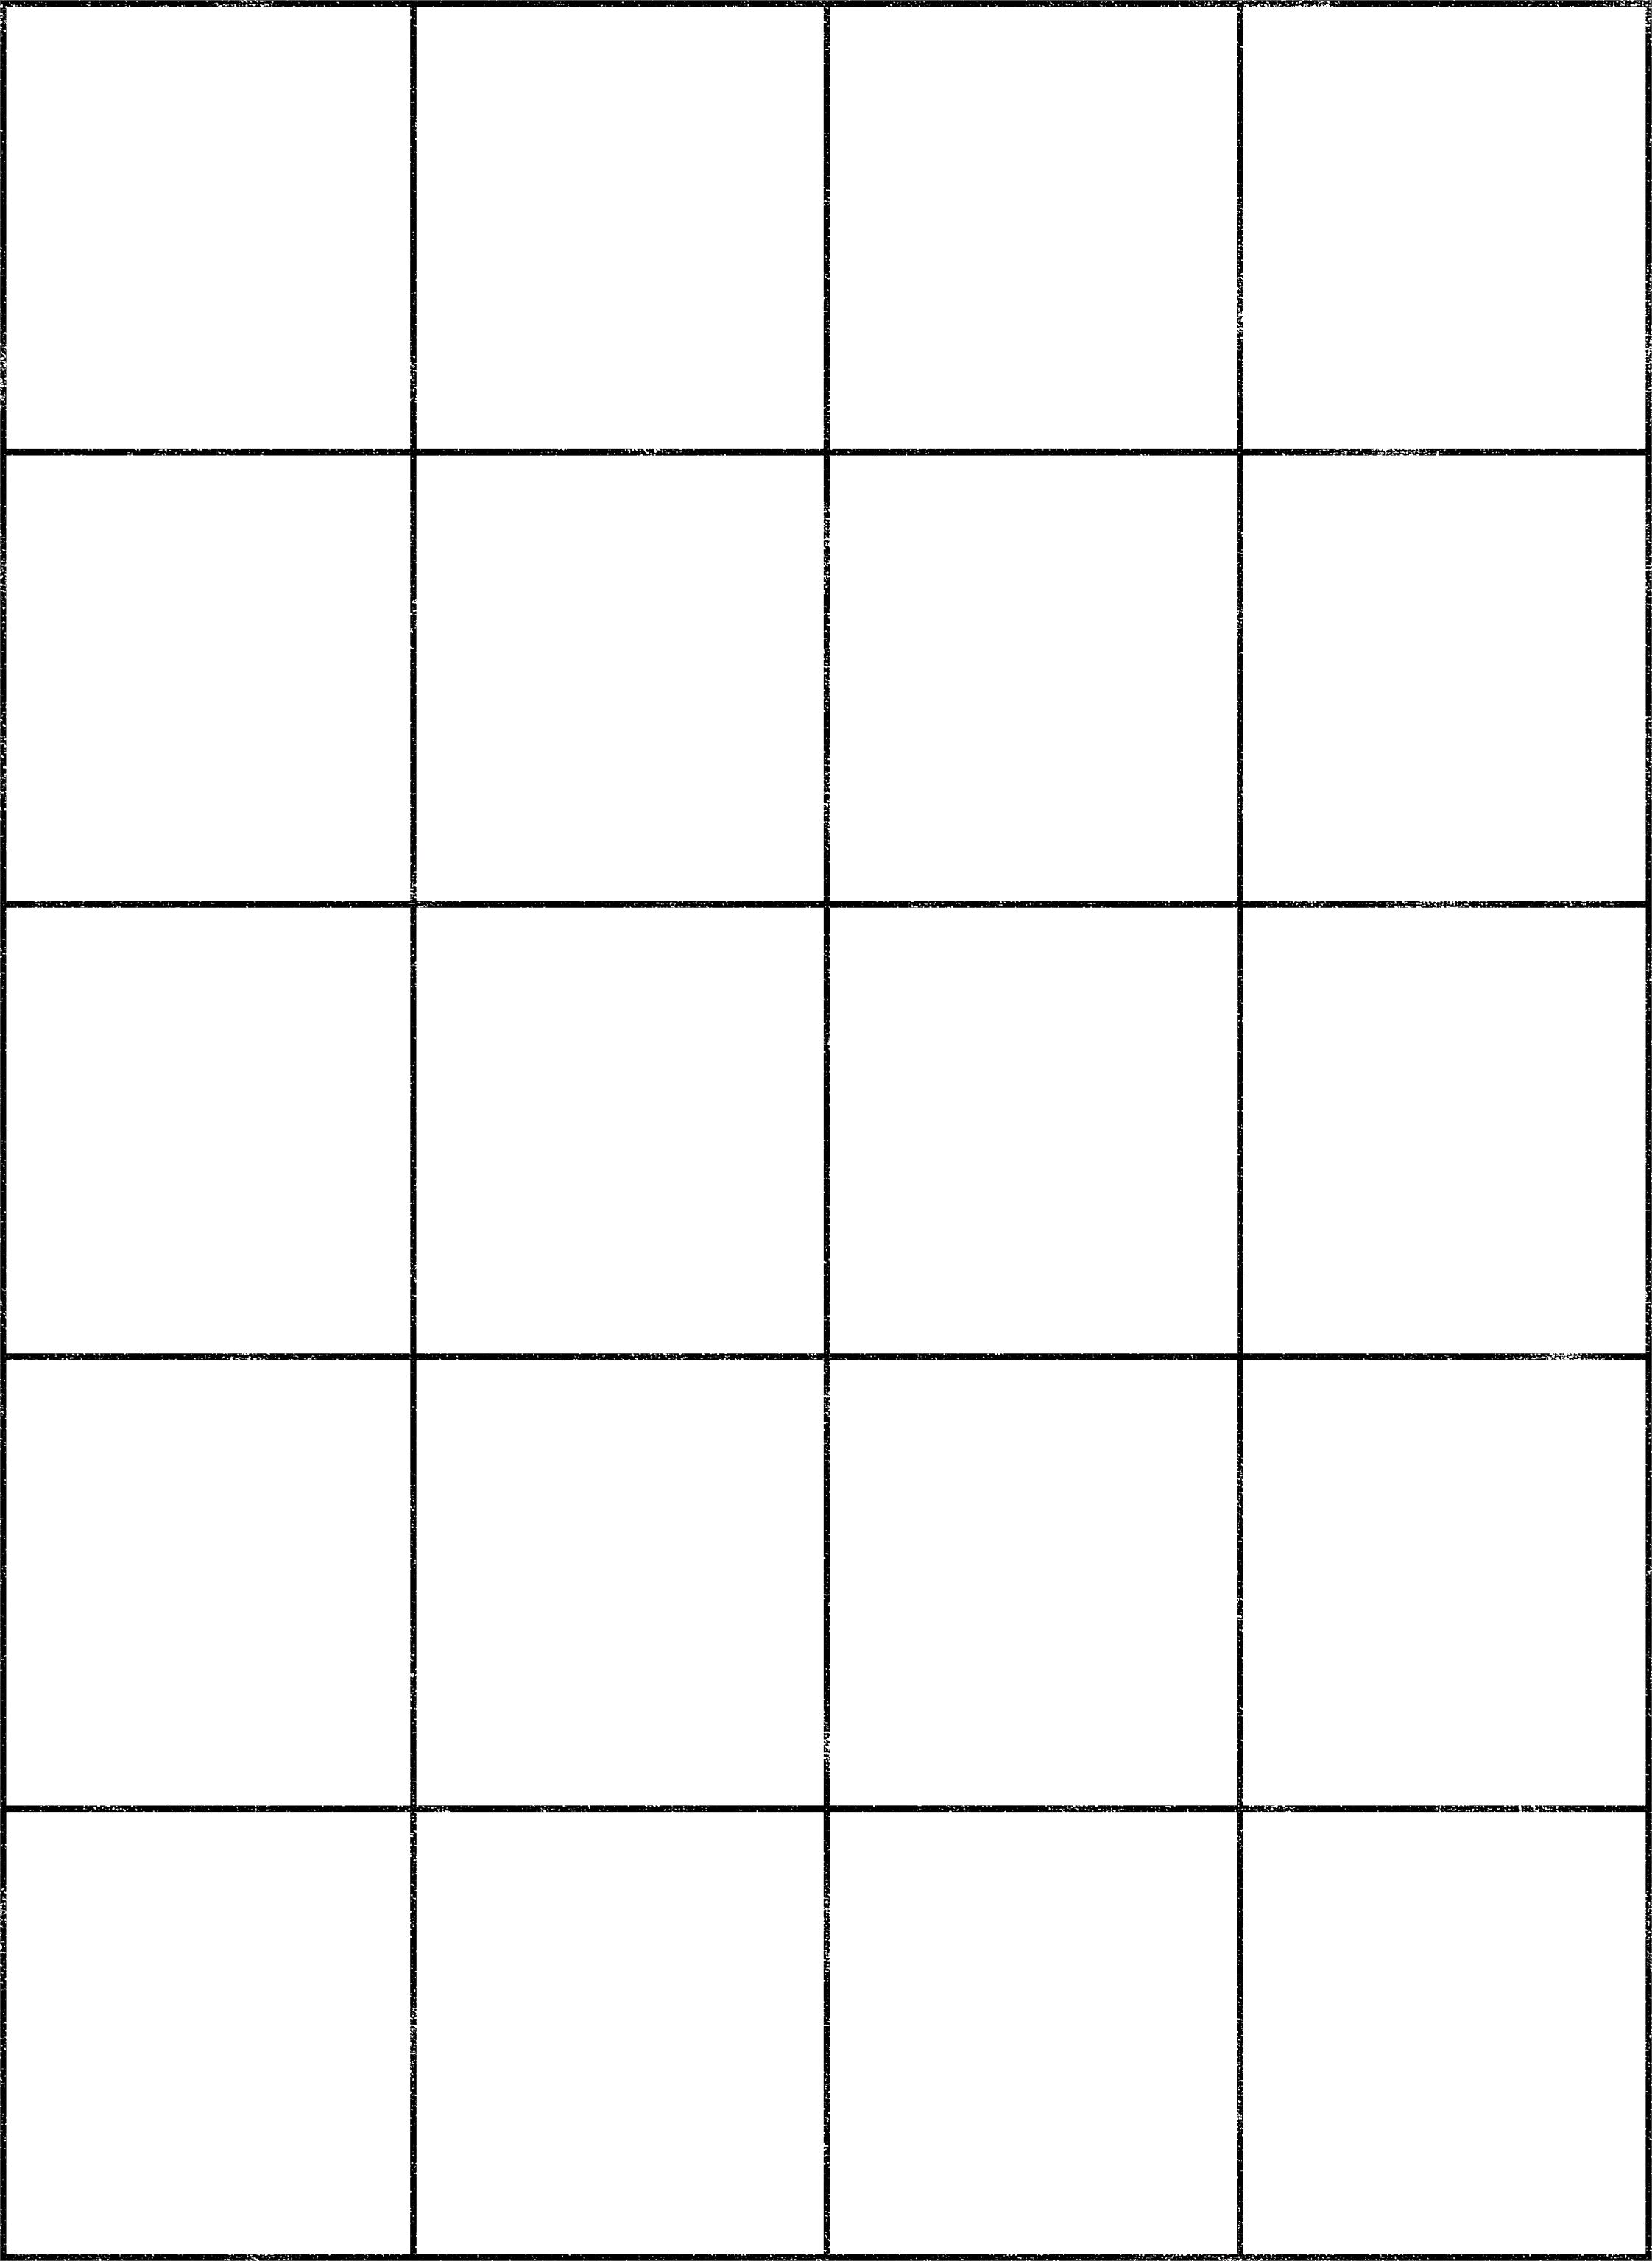 Drawing Grids Template - 4 X 4 Matrix (2244x3071), Png Download